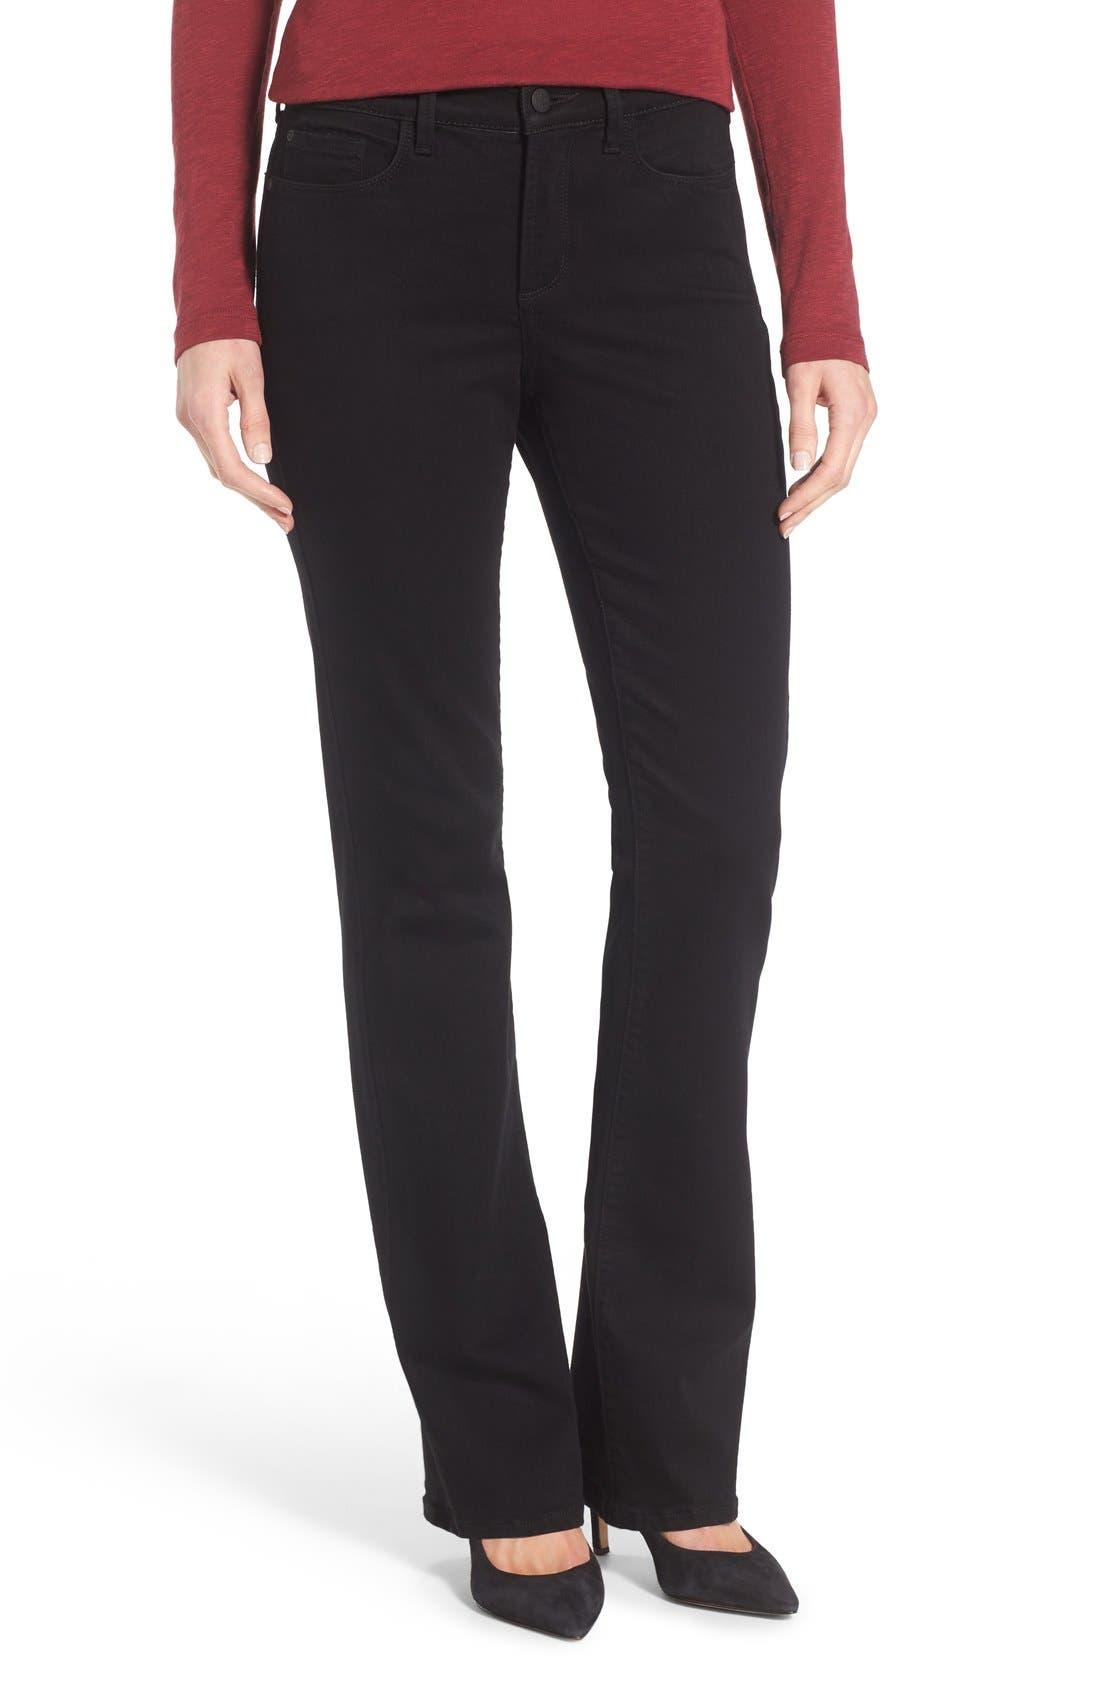 NYDJ 'Barbara' Stretch Bootcut Jeans